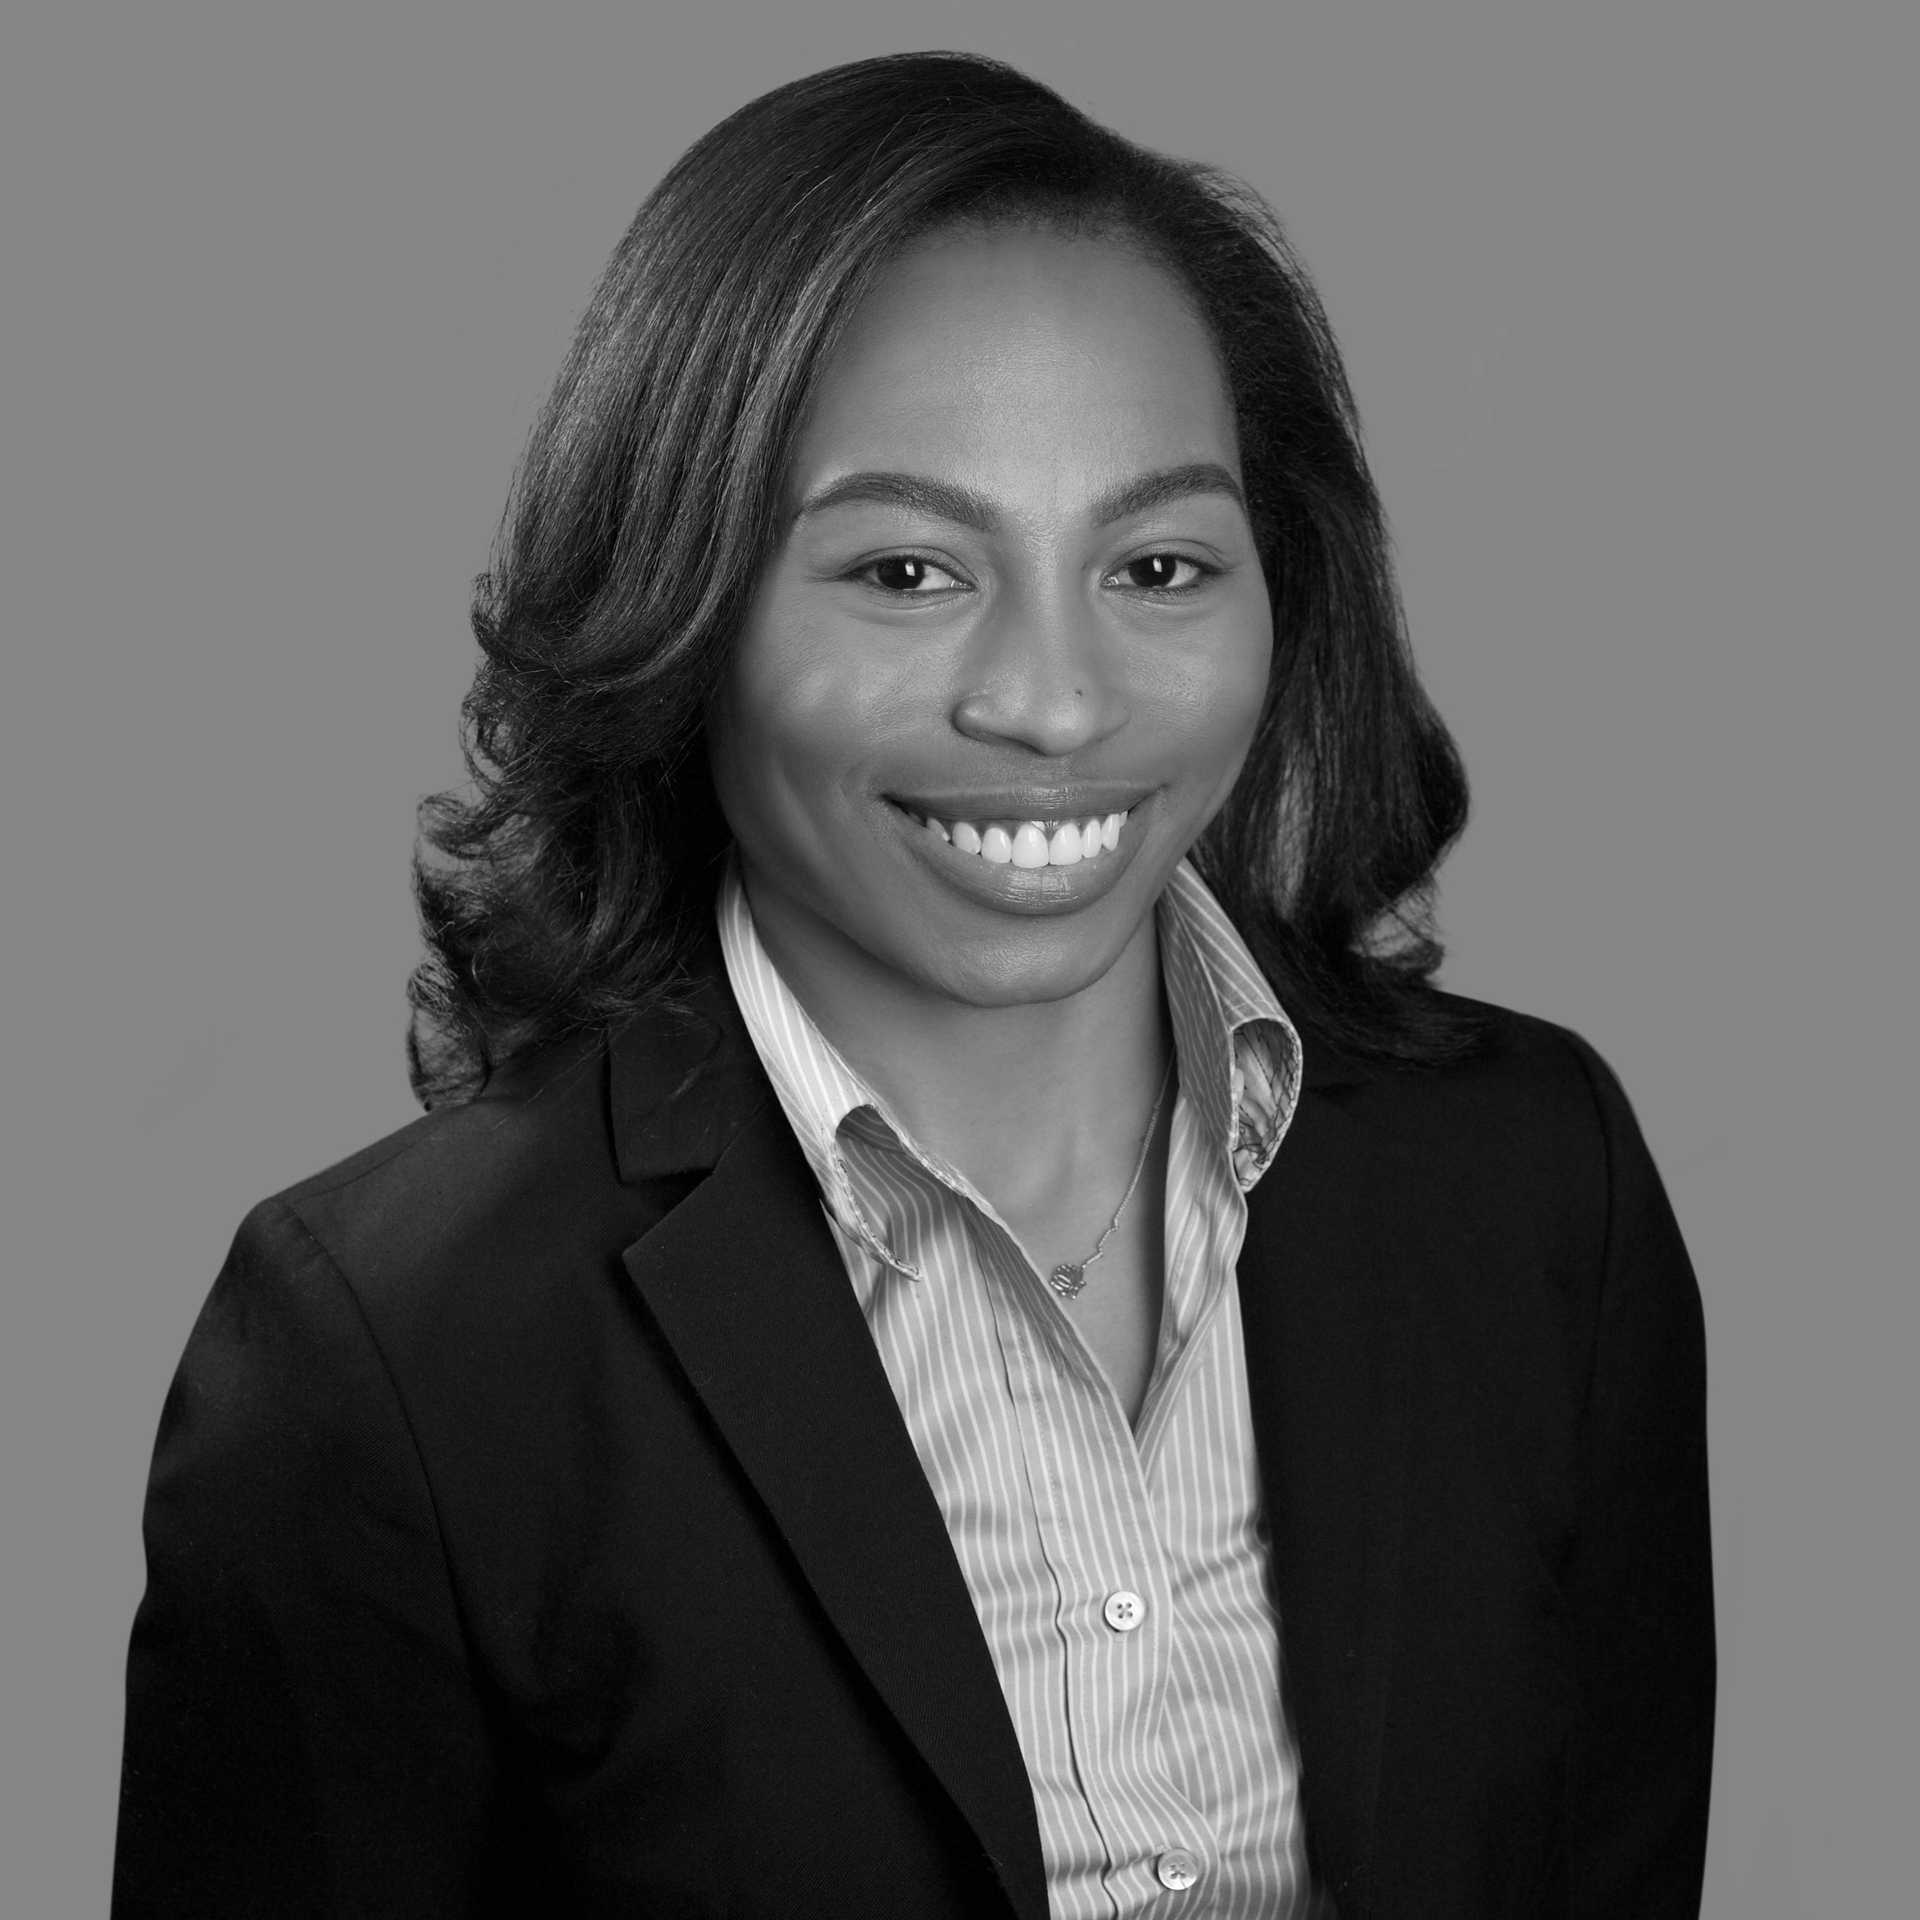 Marlin Hawk New York's Client Operations & Development Lead Raquel Williams